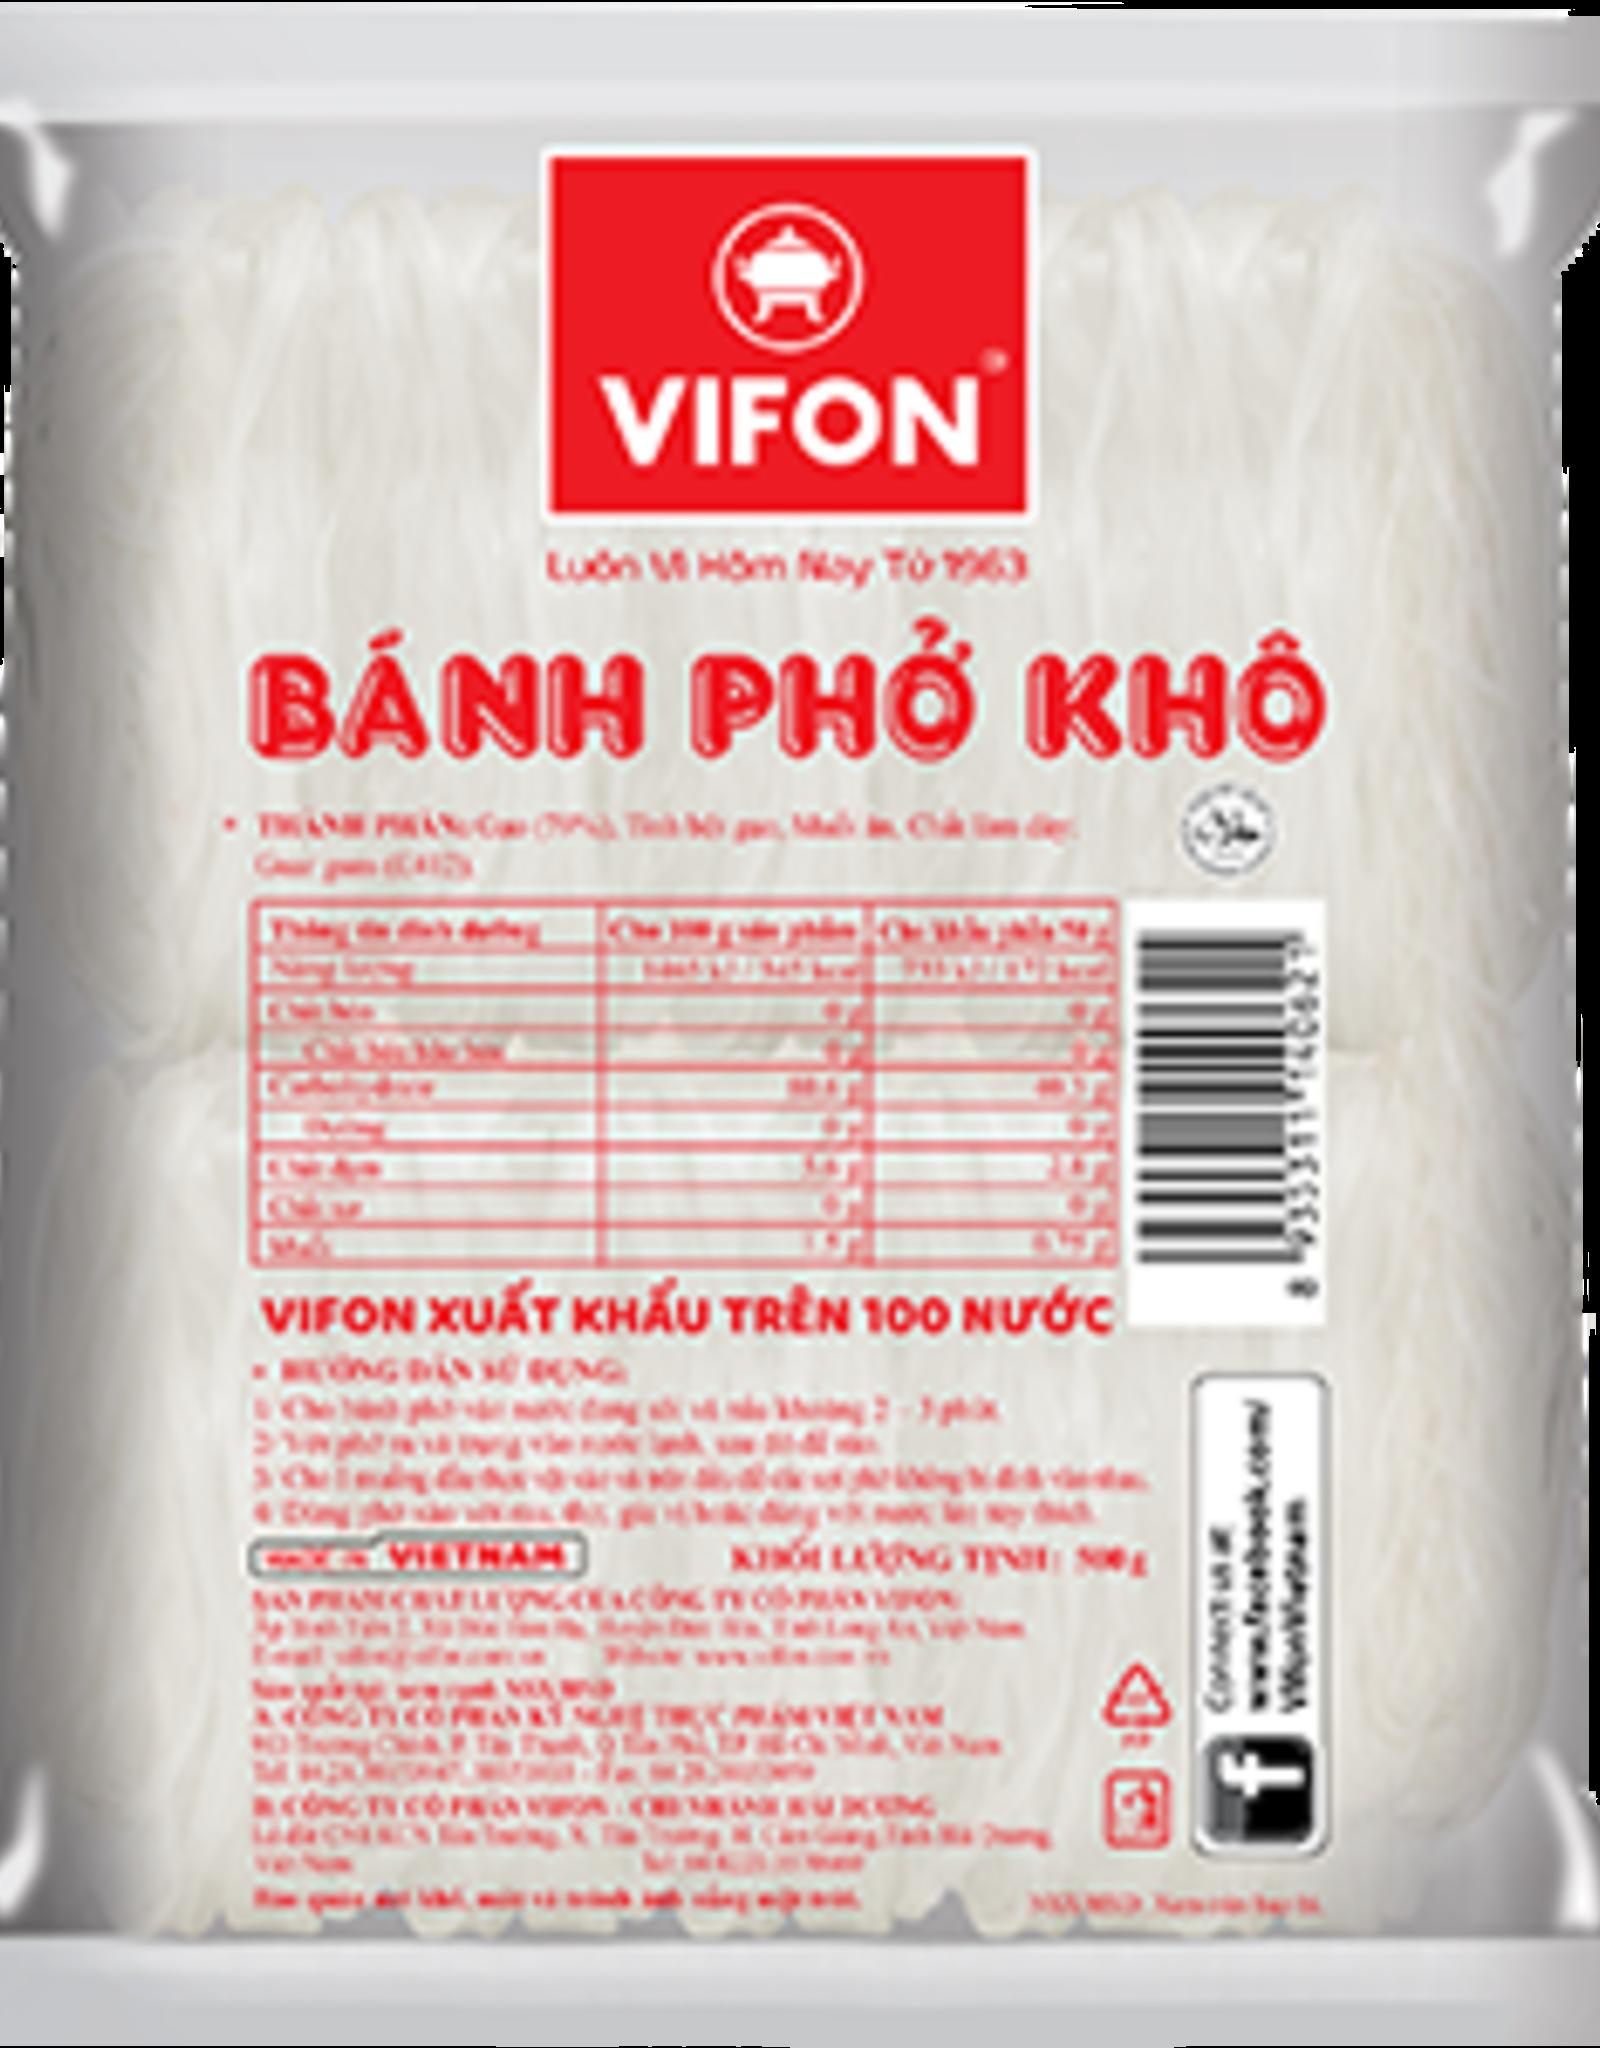 Vifon VIFON Rice Noodle Banh Pho Khô 3mm 500g